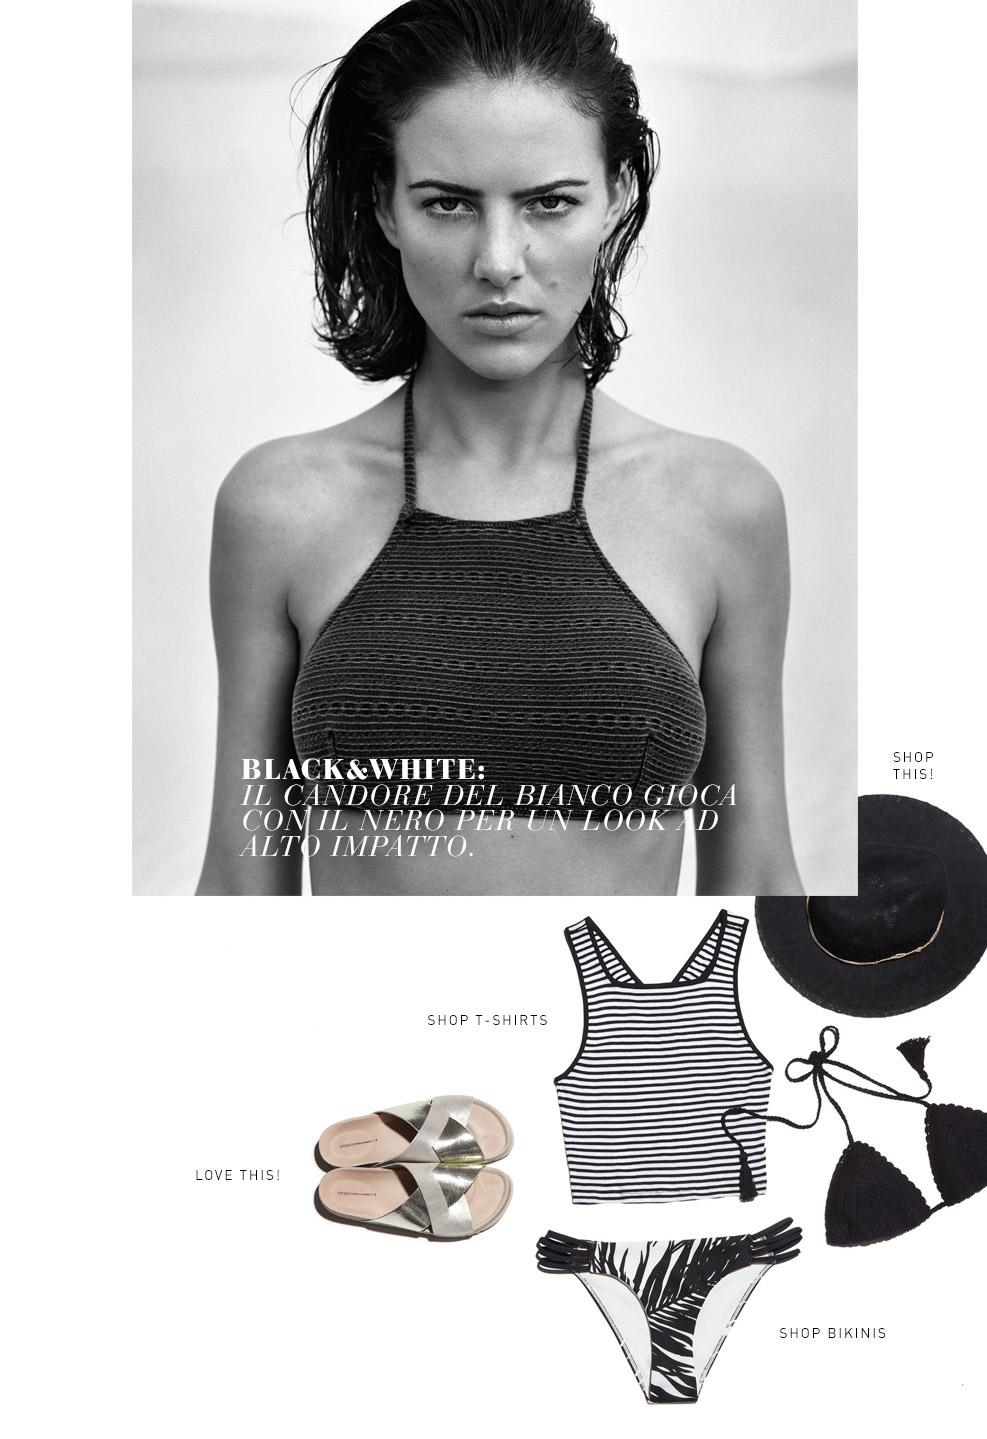 Vogue Beach, il beachwear secondo Oysho per l'estate 2015